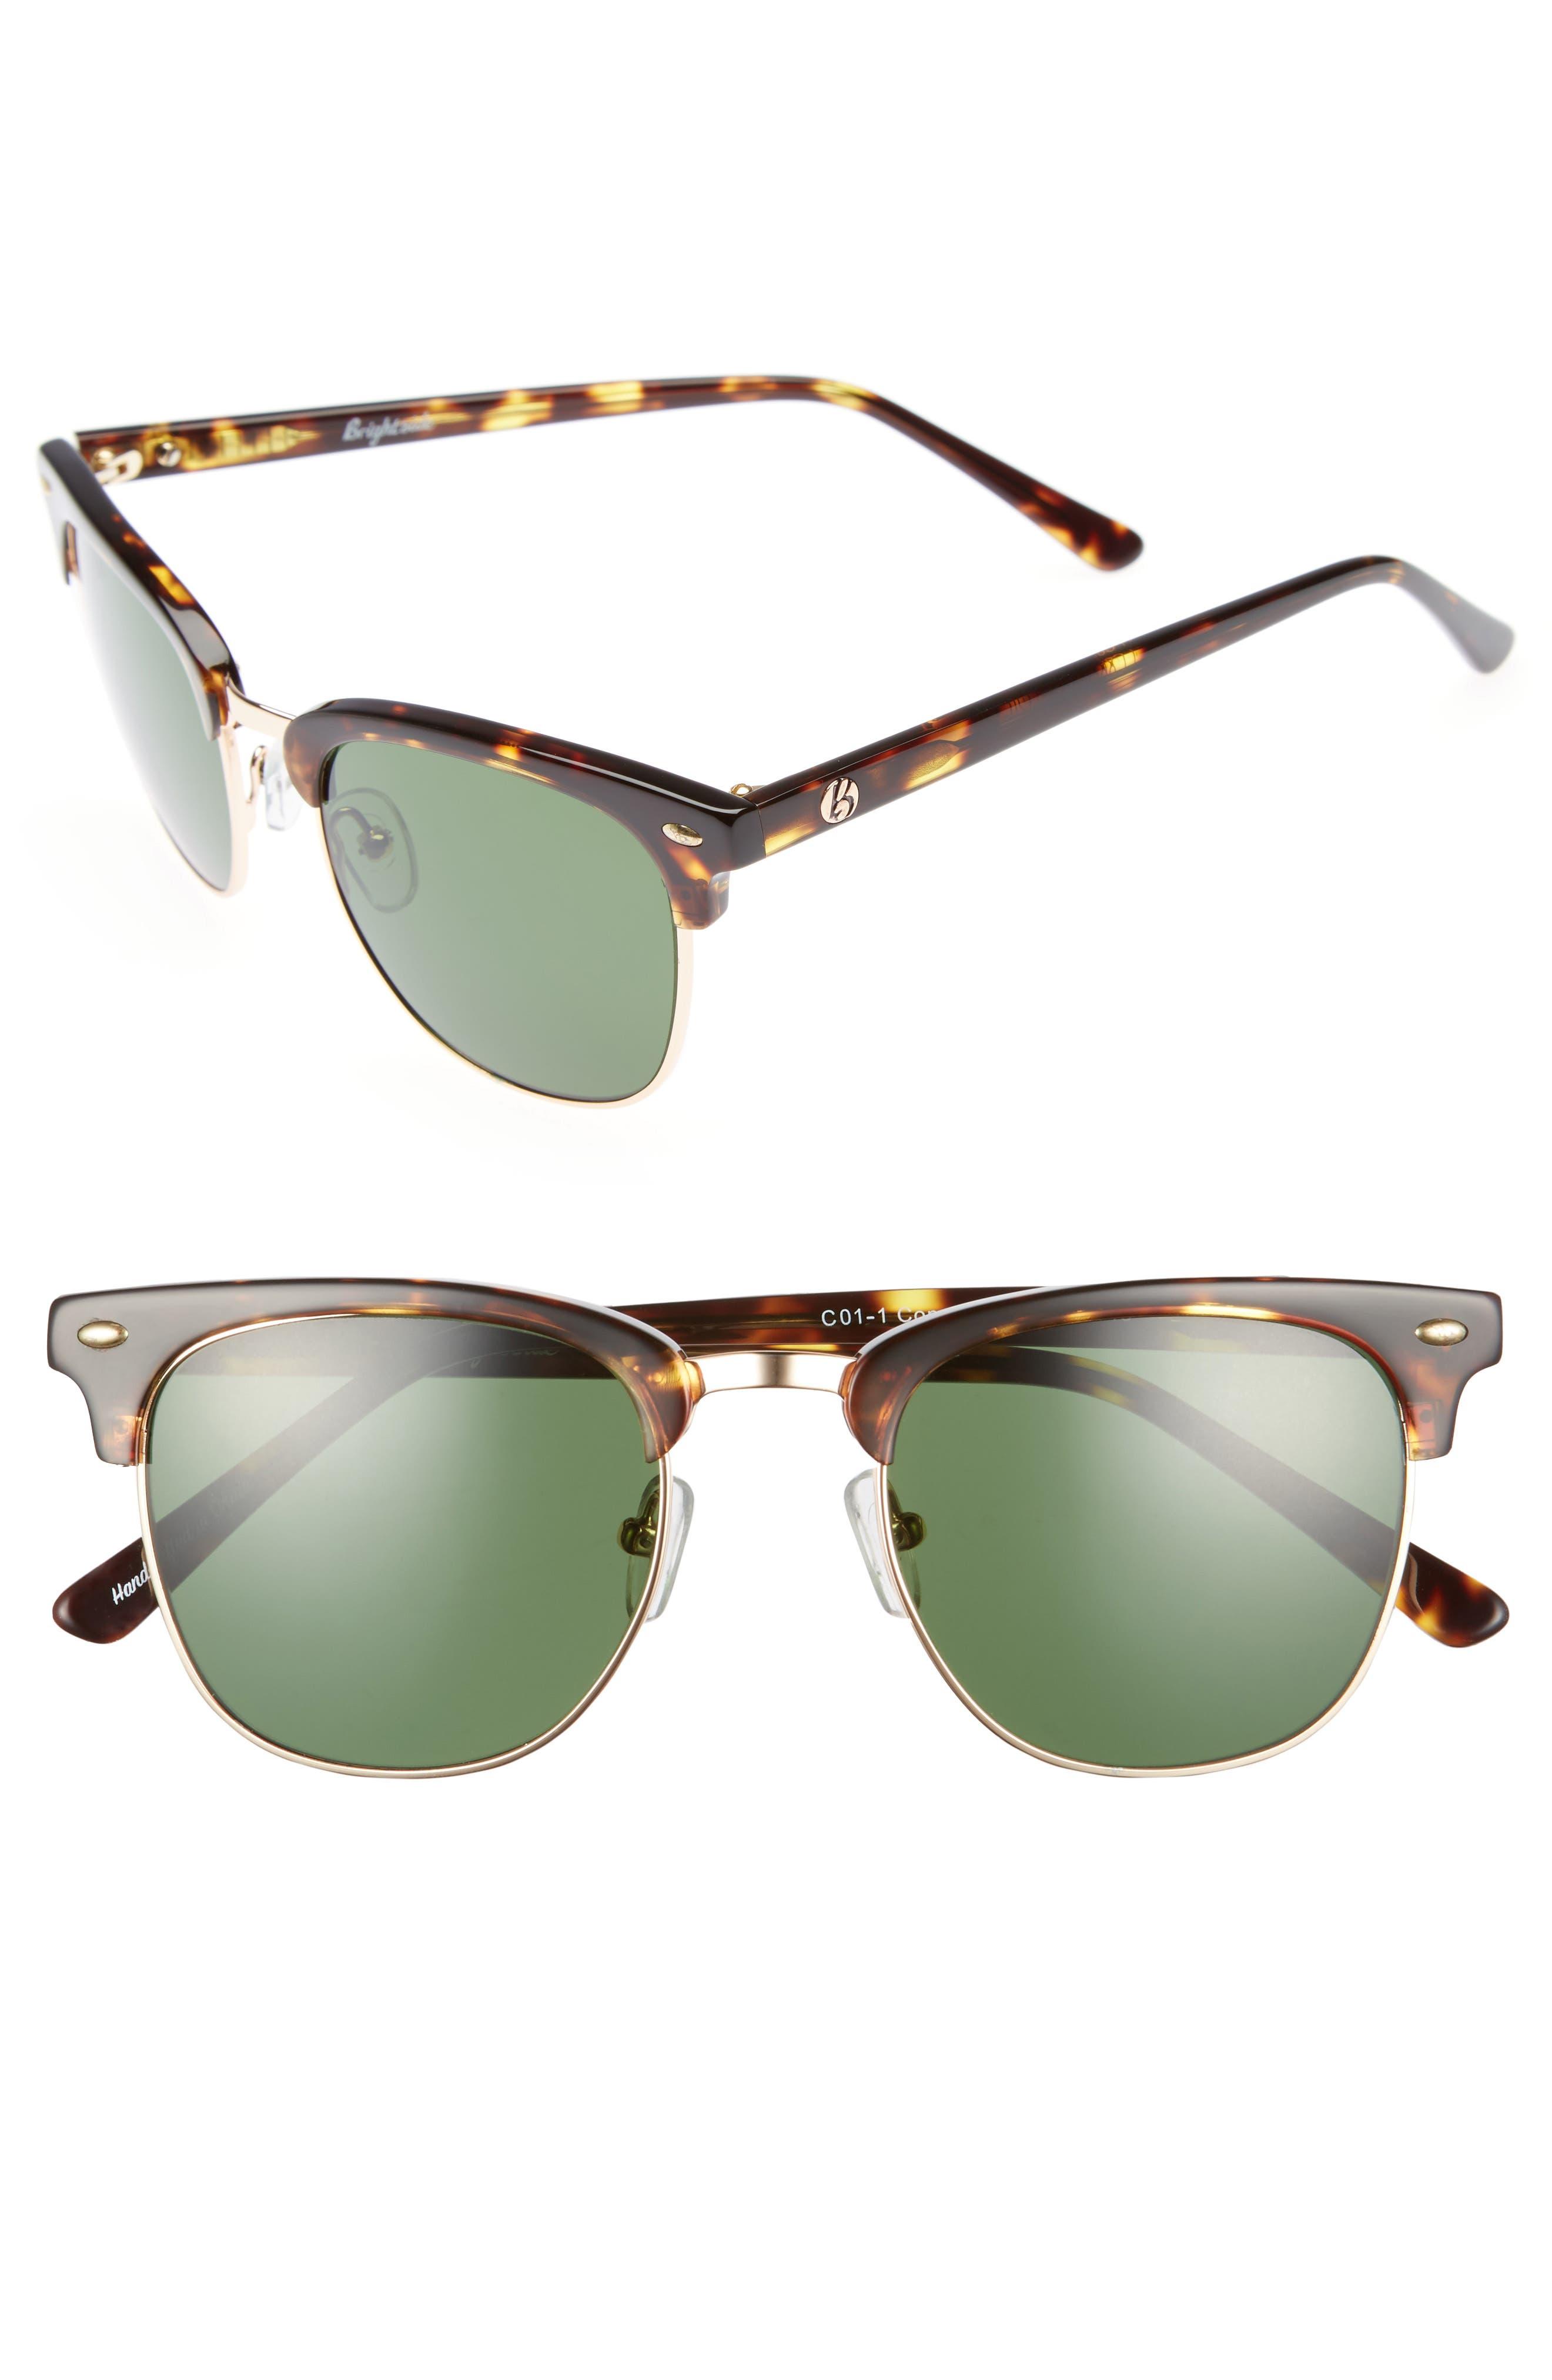 Copeland 51mm Sunglasses,                         Main,                         color, Golden Tortoise/ Green